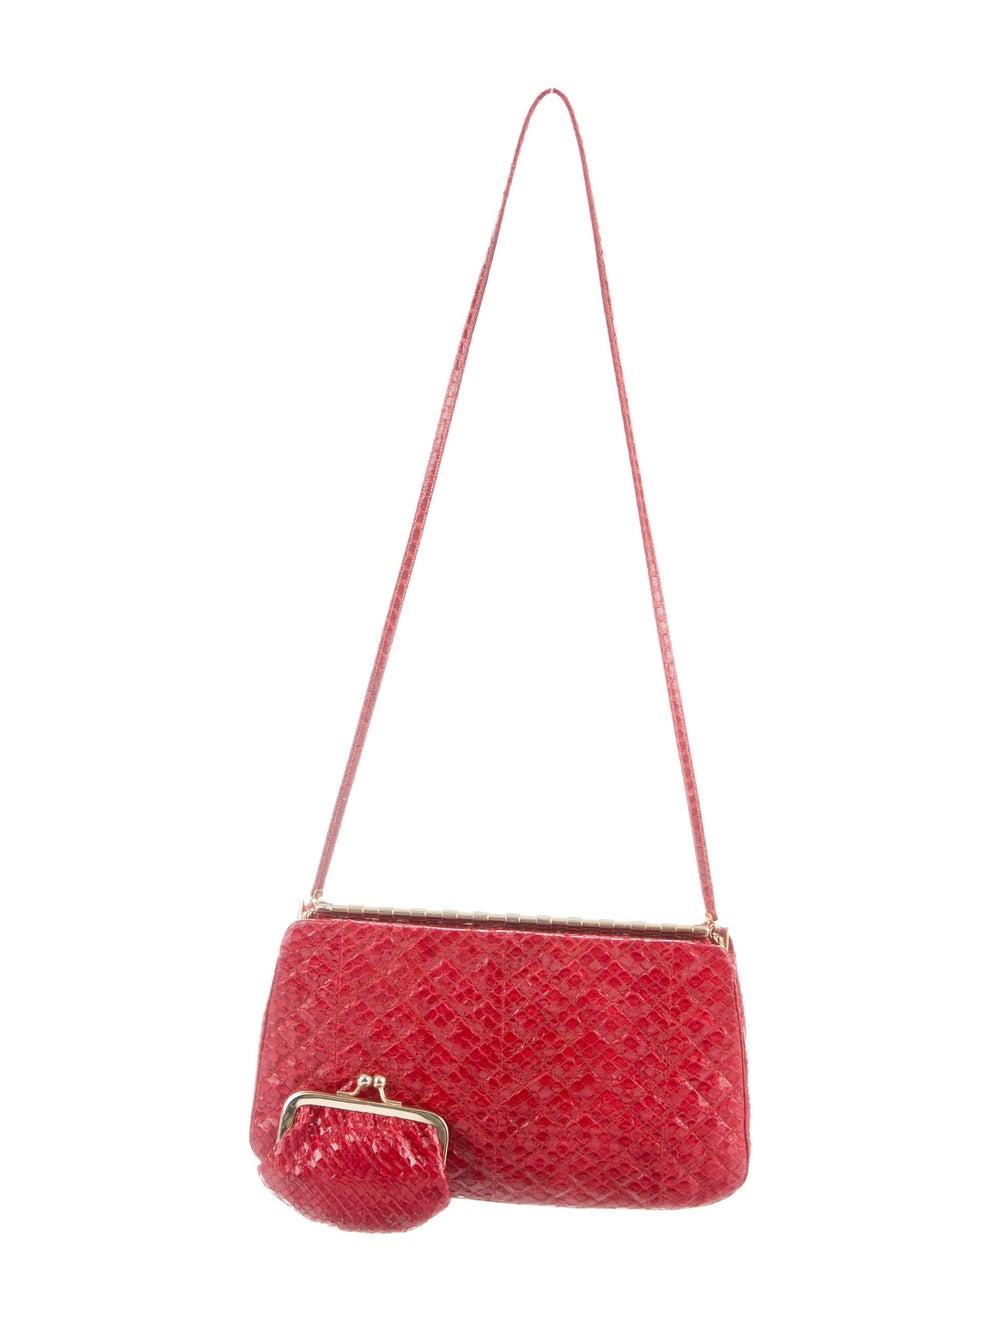 Judith Leiber Snakeskin Evening Bag Red - image 4